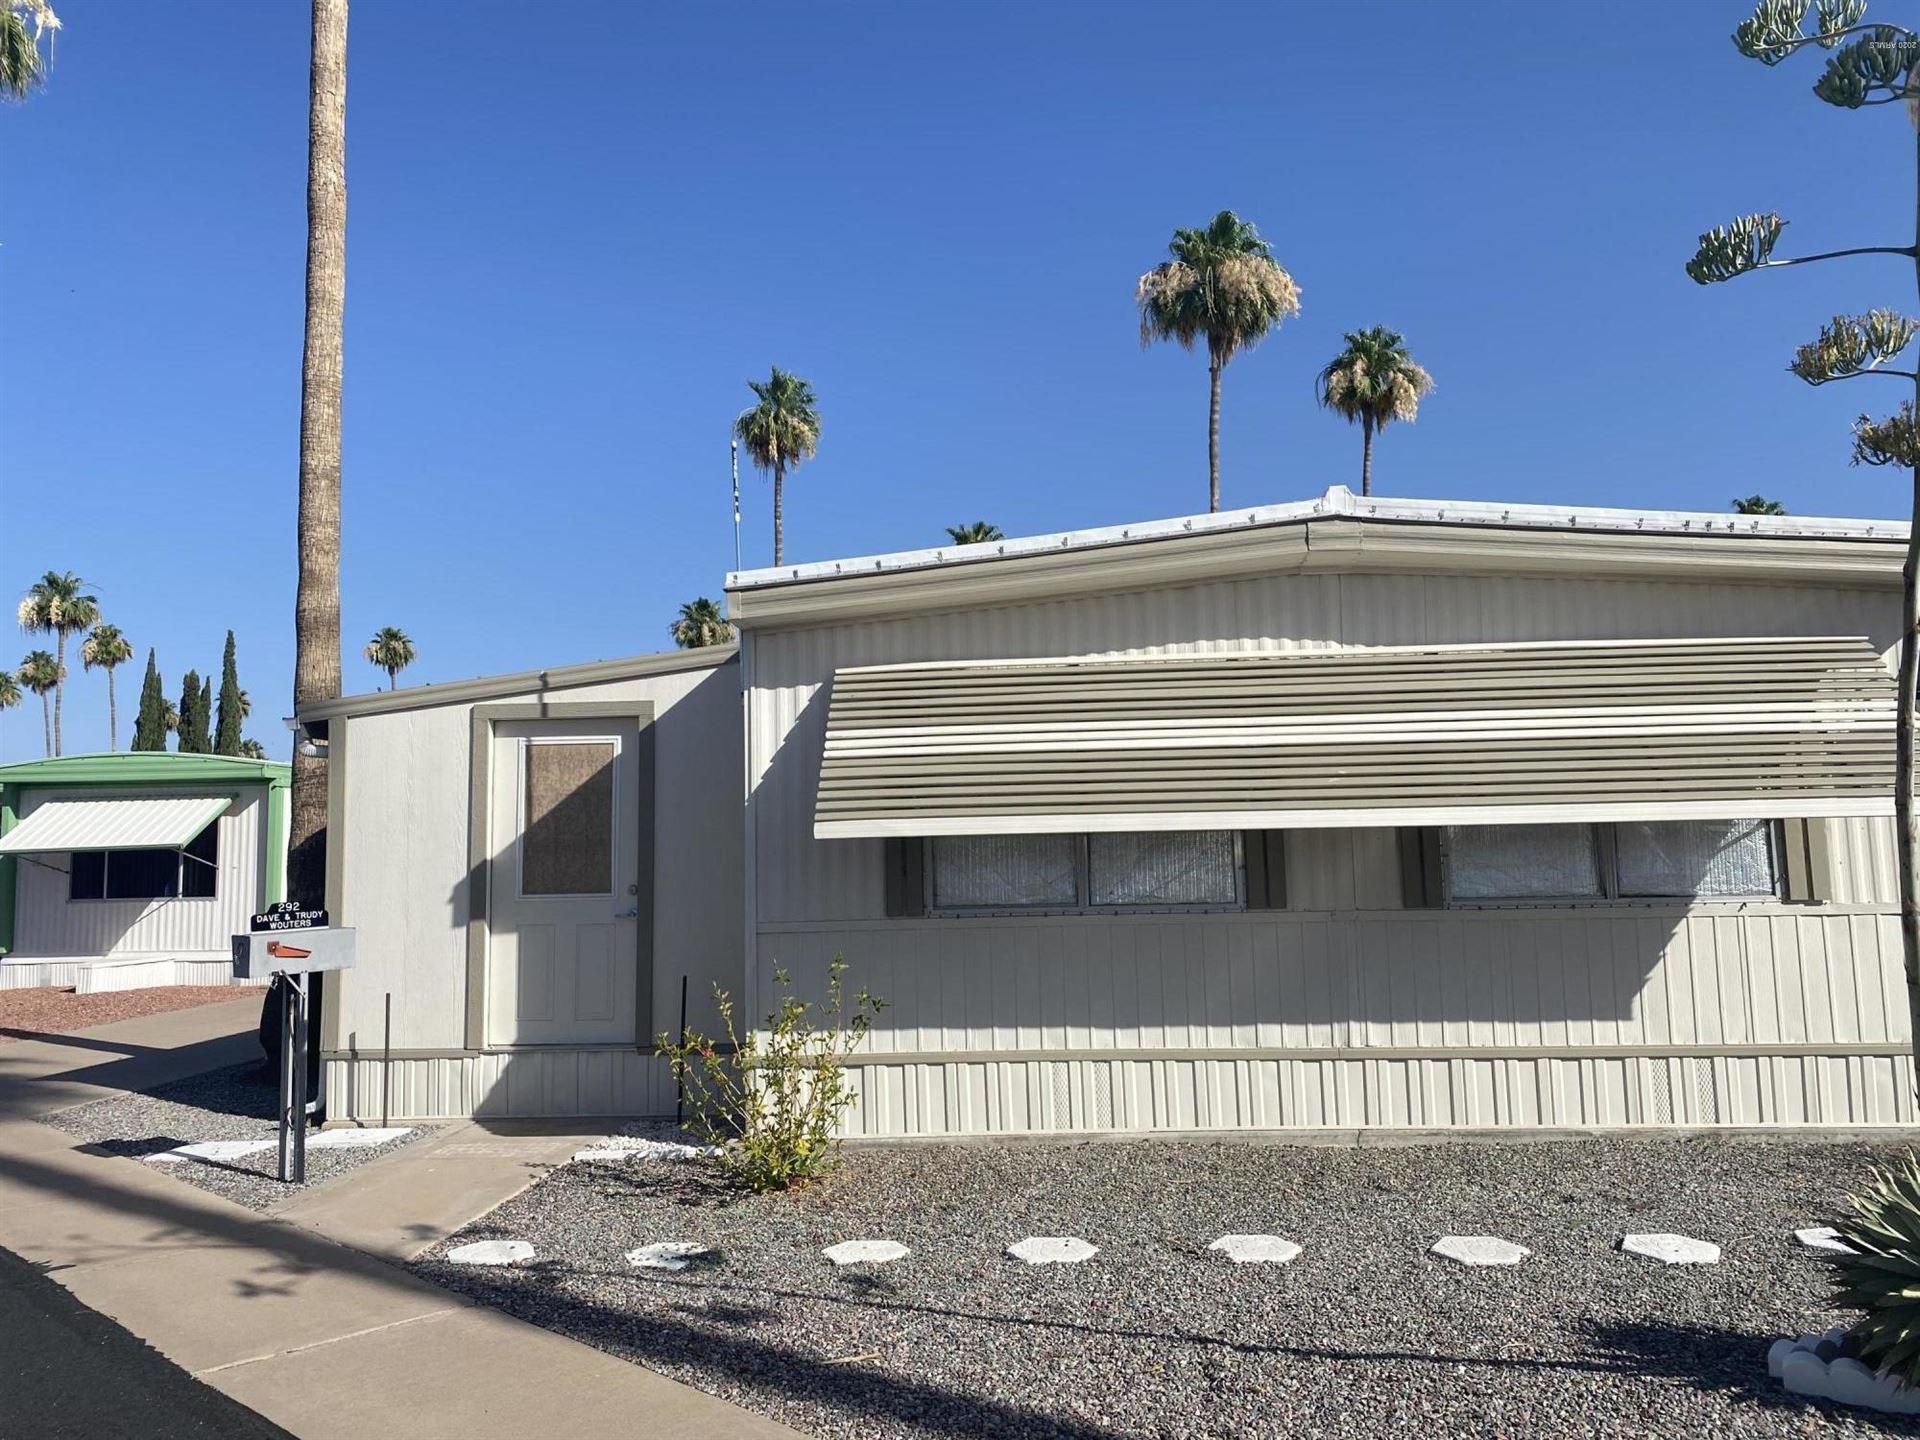 4065 E UNIVERSITY Drive #292, Mesa, AZ 85205 - #: 6087926